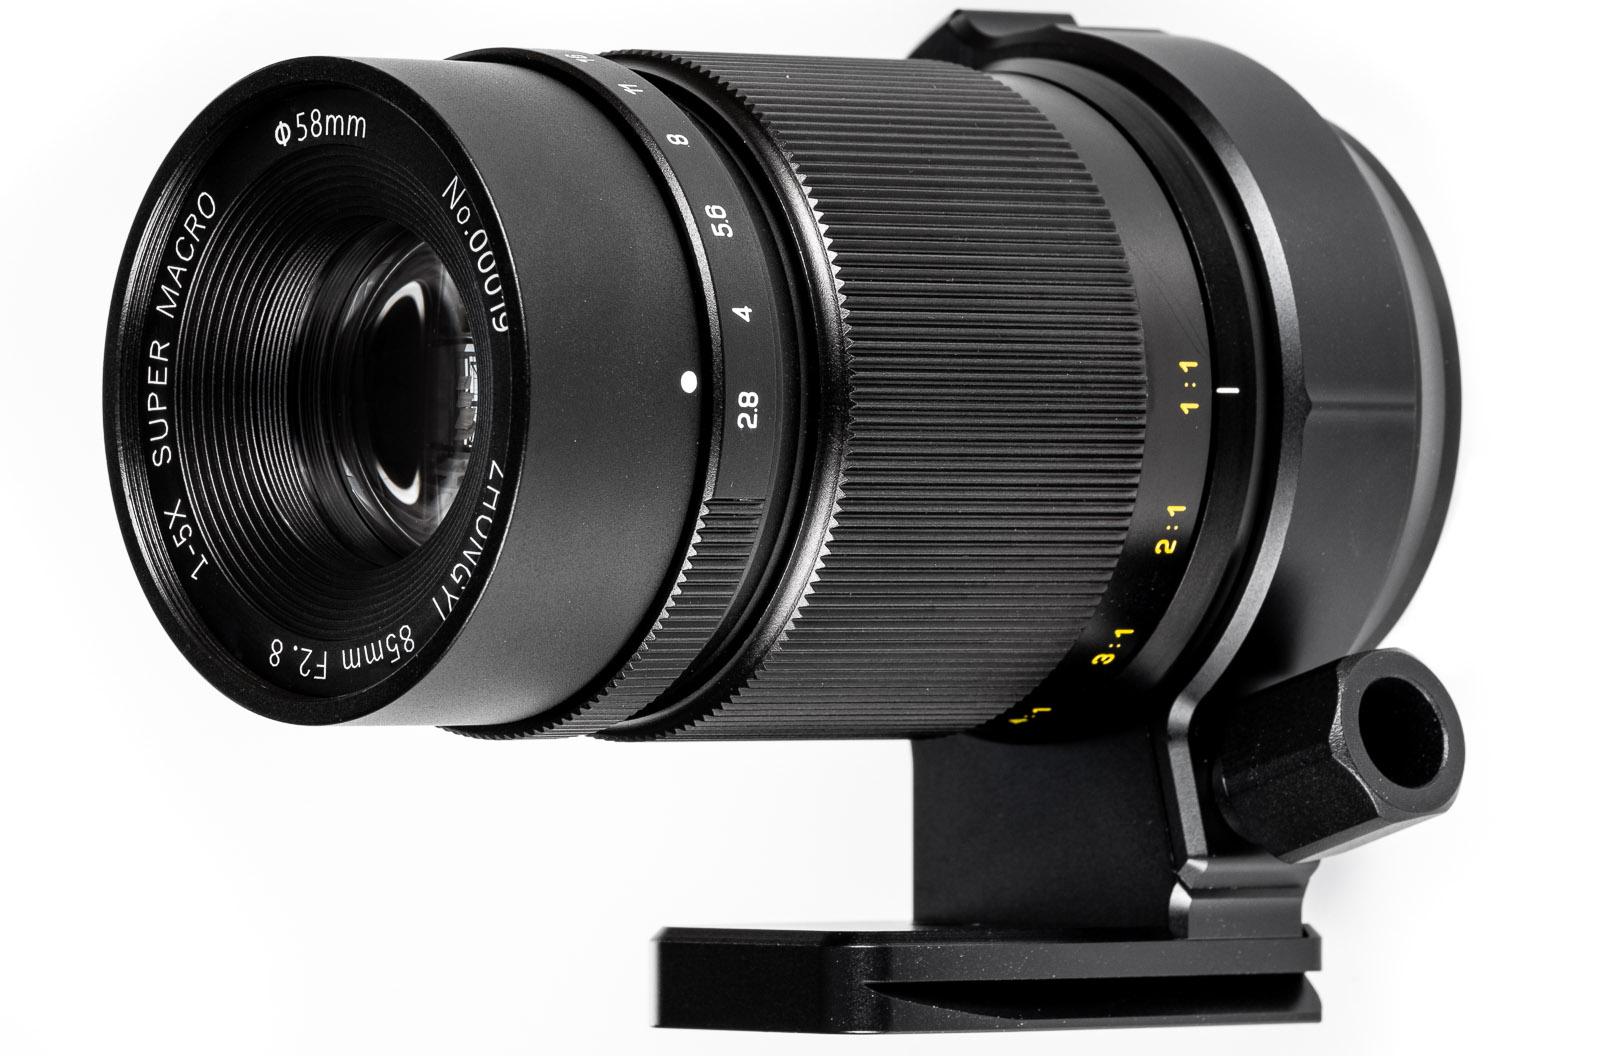 Mitakon Creator 85mm f/2.8 1-5X Super Macro